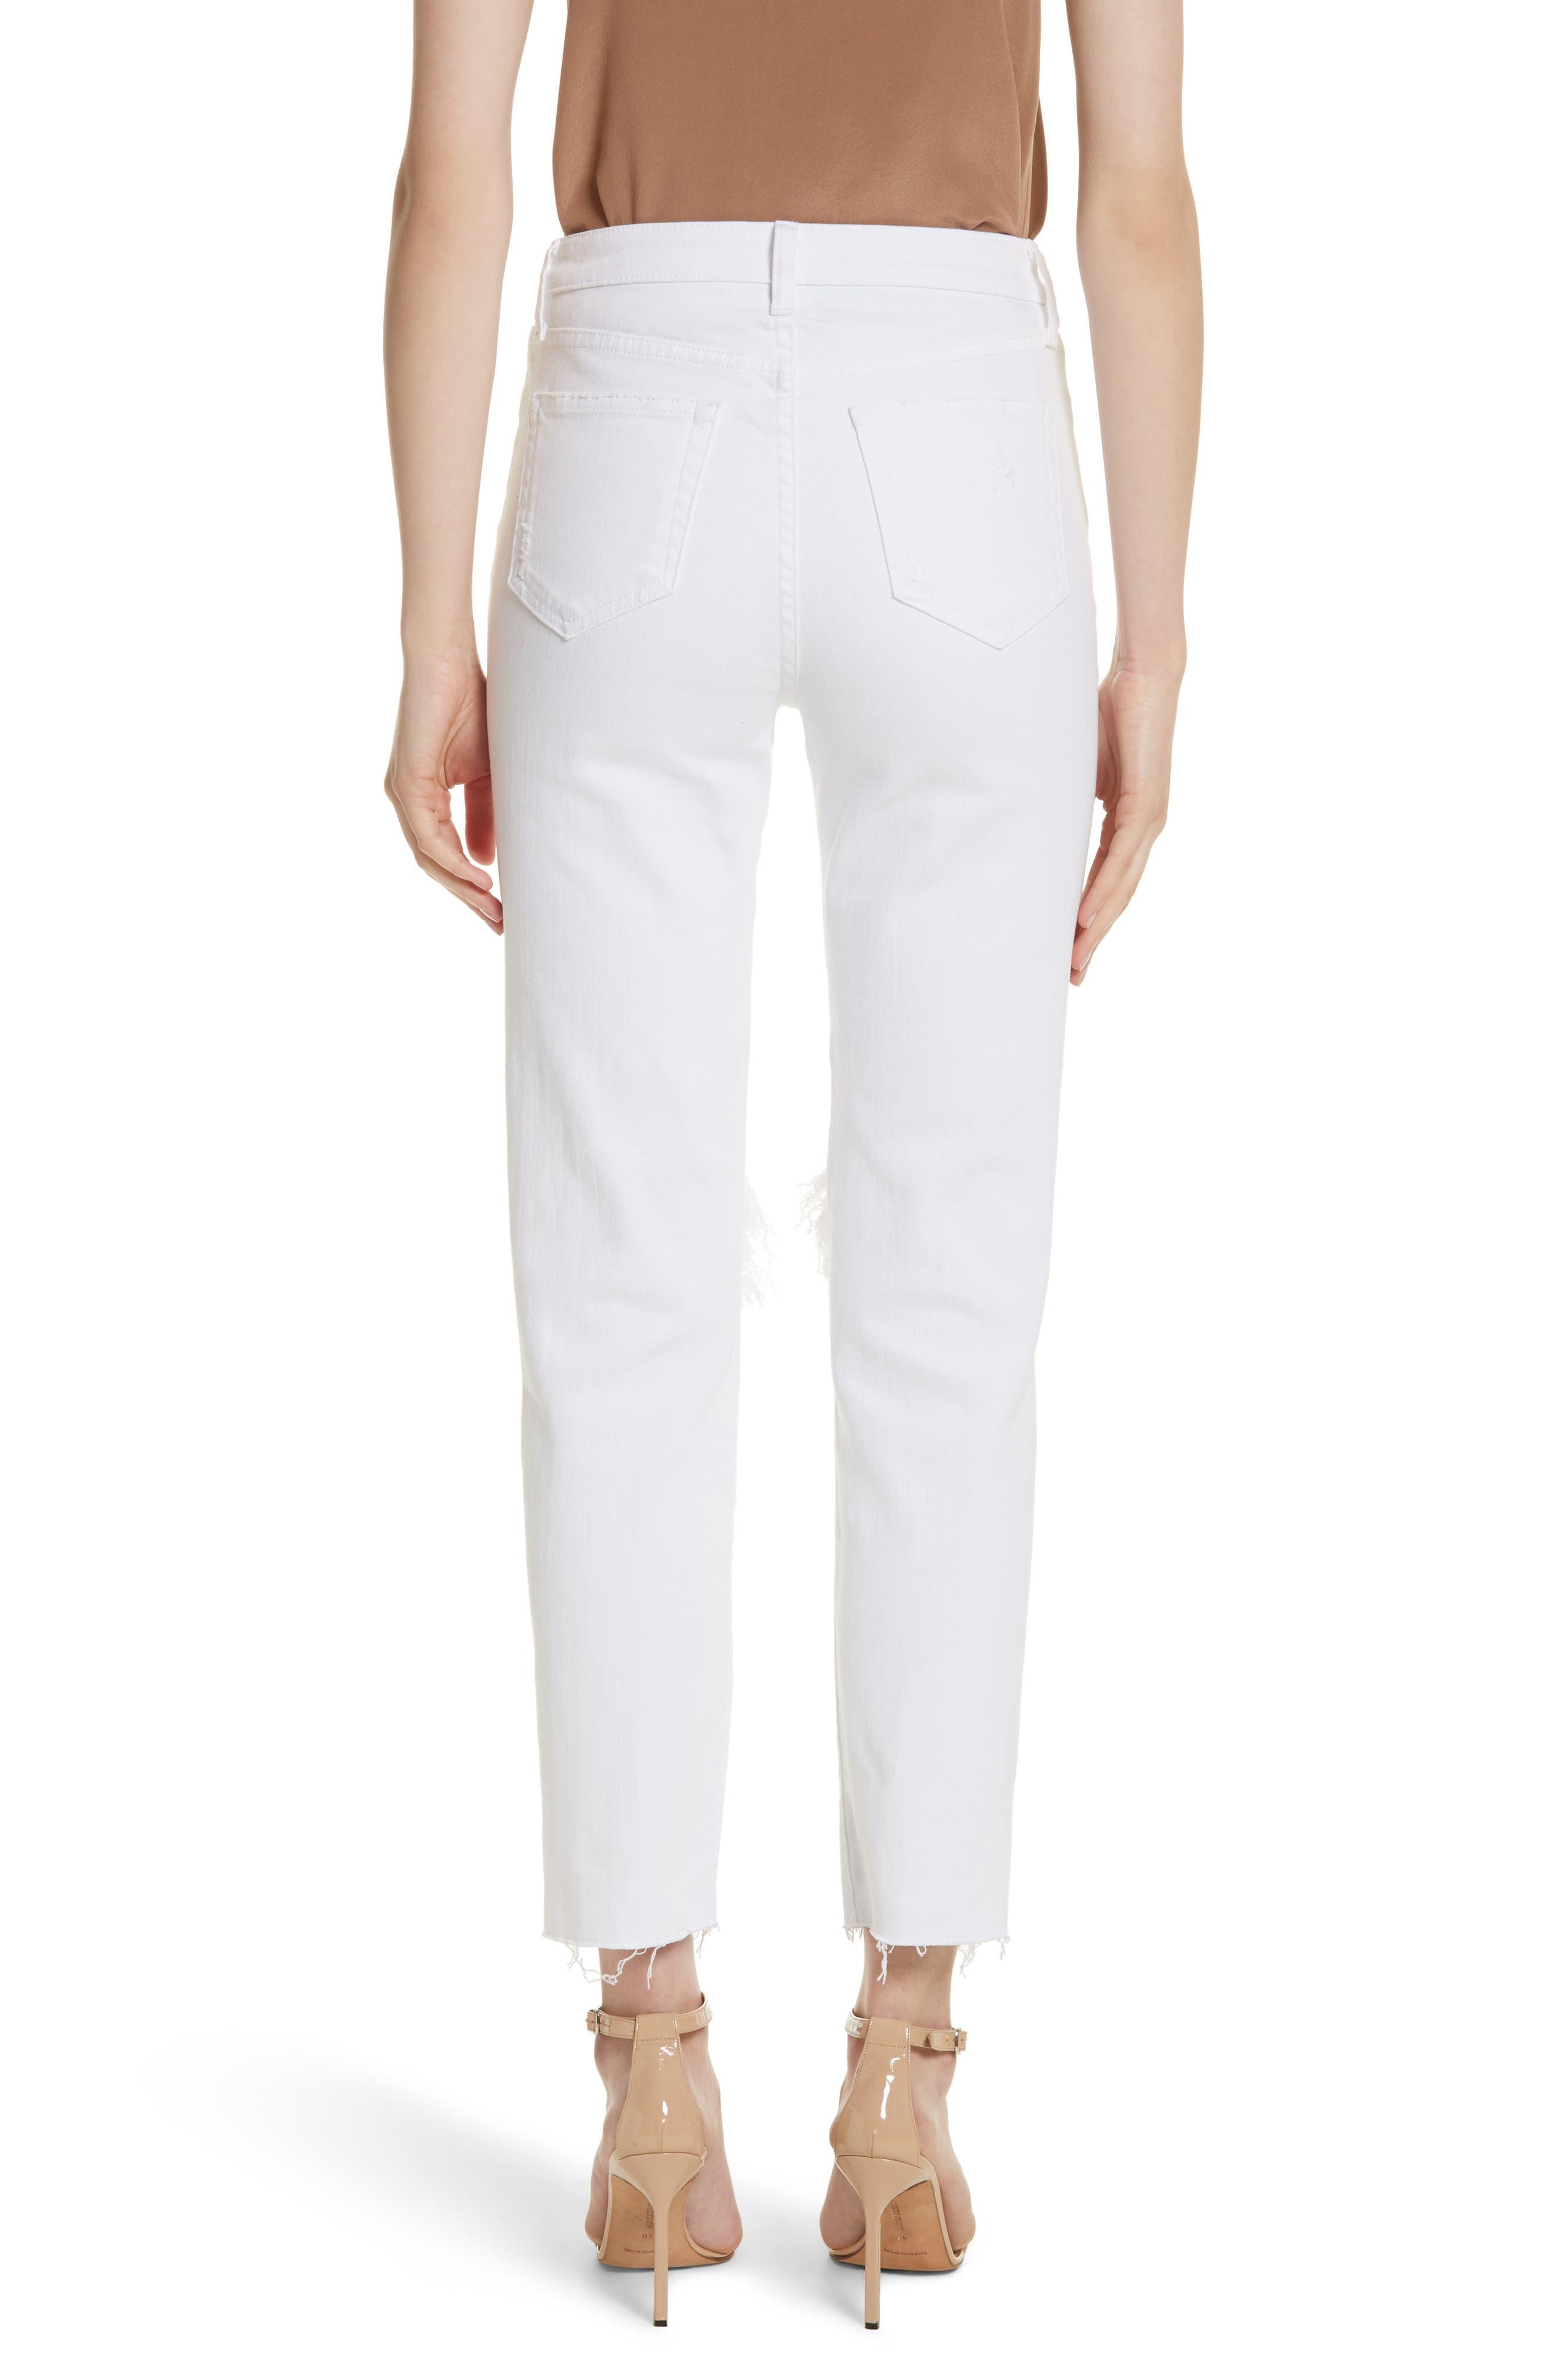 Audrina Ripped Straight Leg Crop Jeans,                             Alternate thumbnail 2, color,                             BLANC WORN DESTRUCT